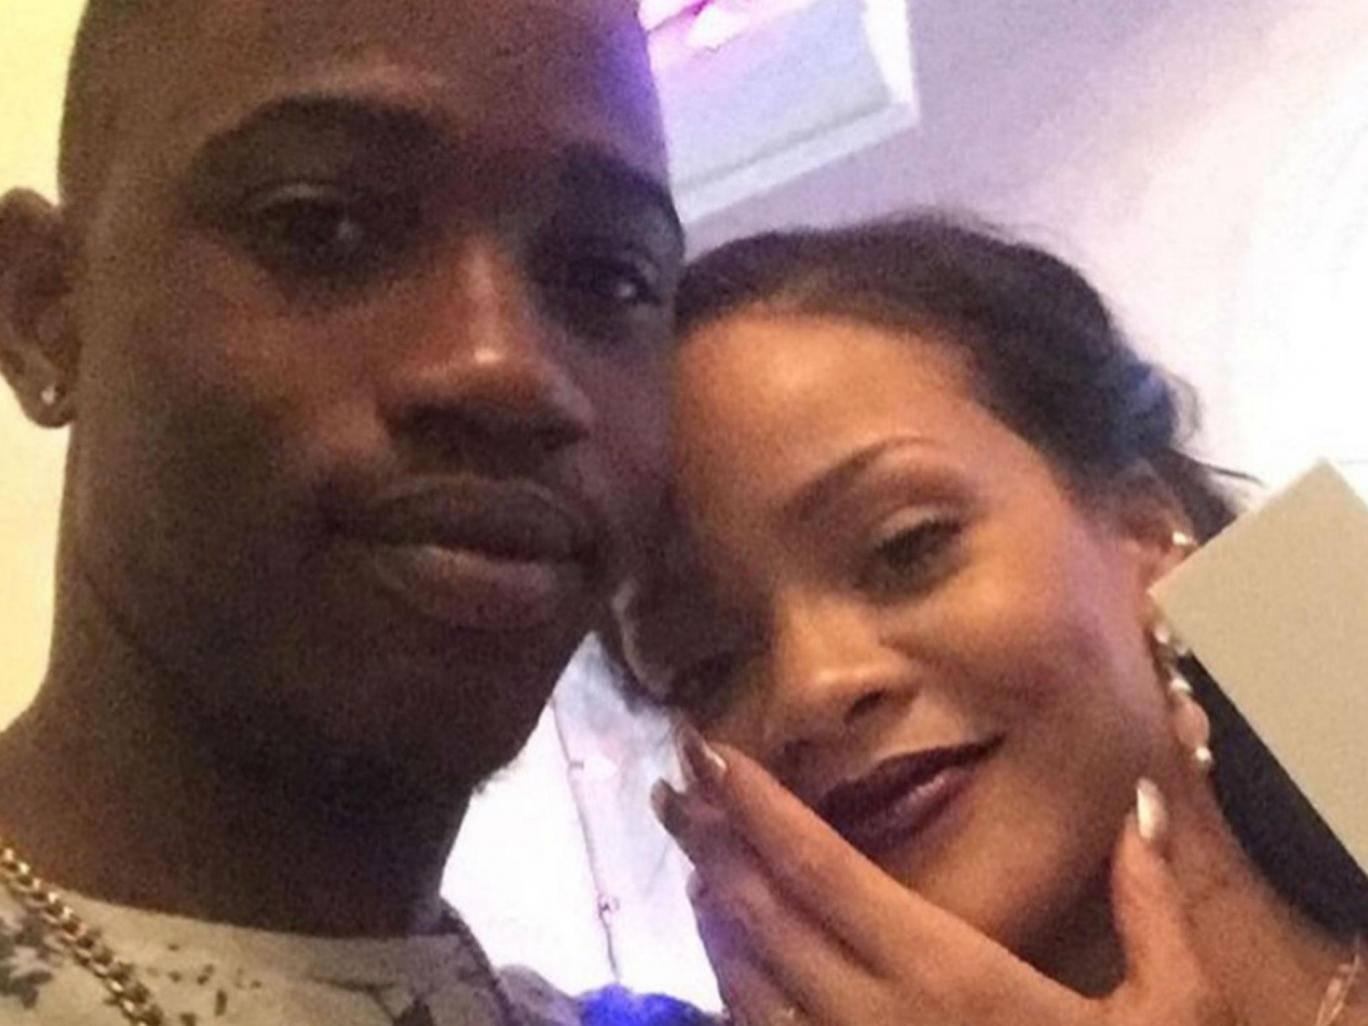 Rihanna Mourns Following Tragic News Just a Day After Celebrating Christmas (Photos)